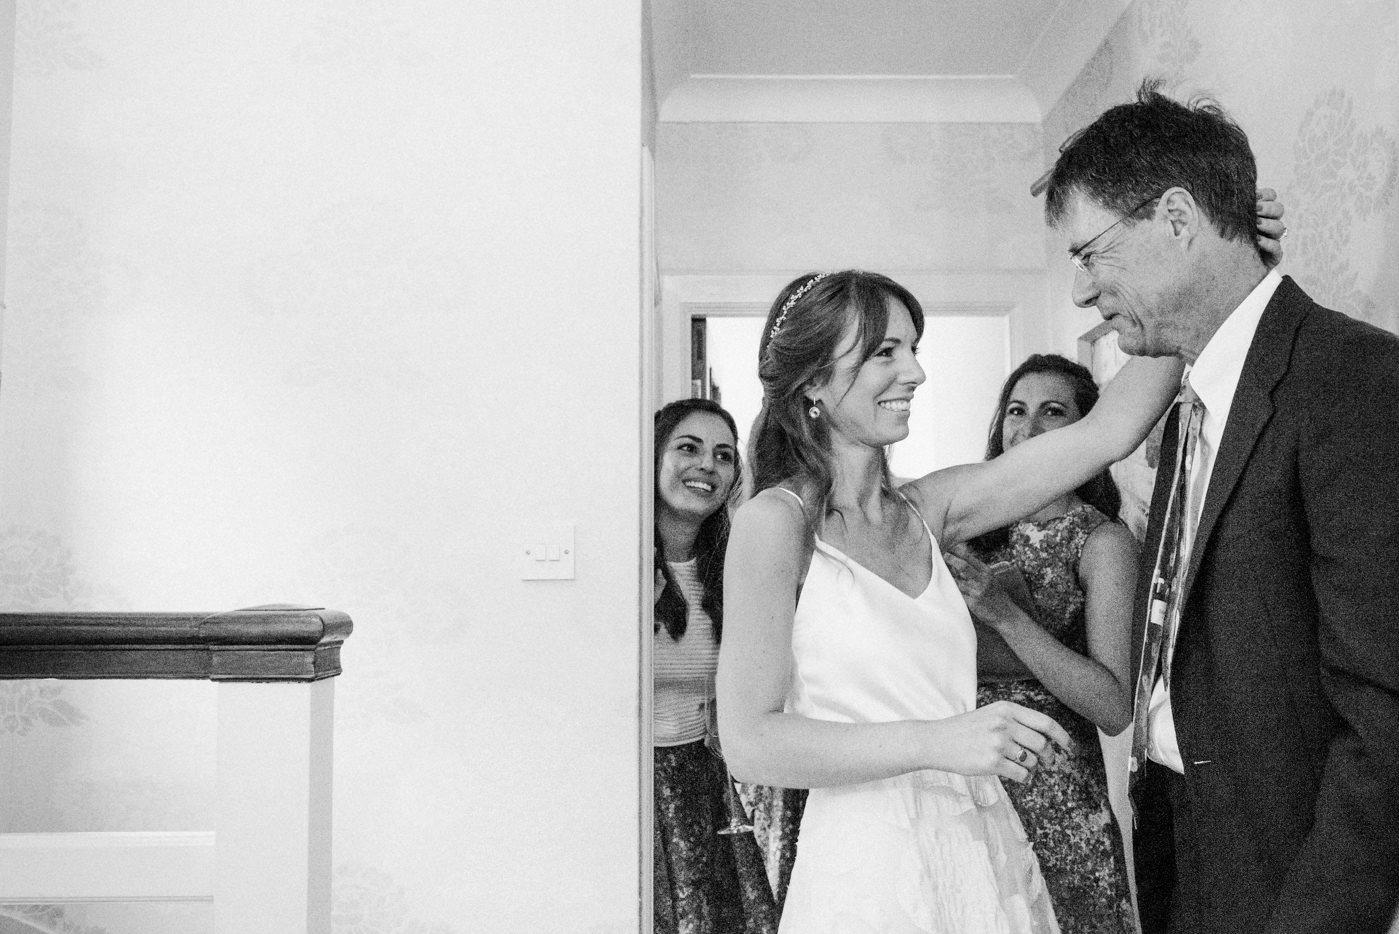 bignor-park-wedding-photography-robyn-and-tom-27